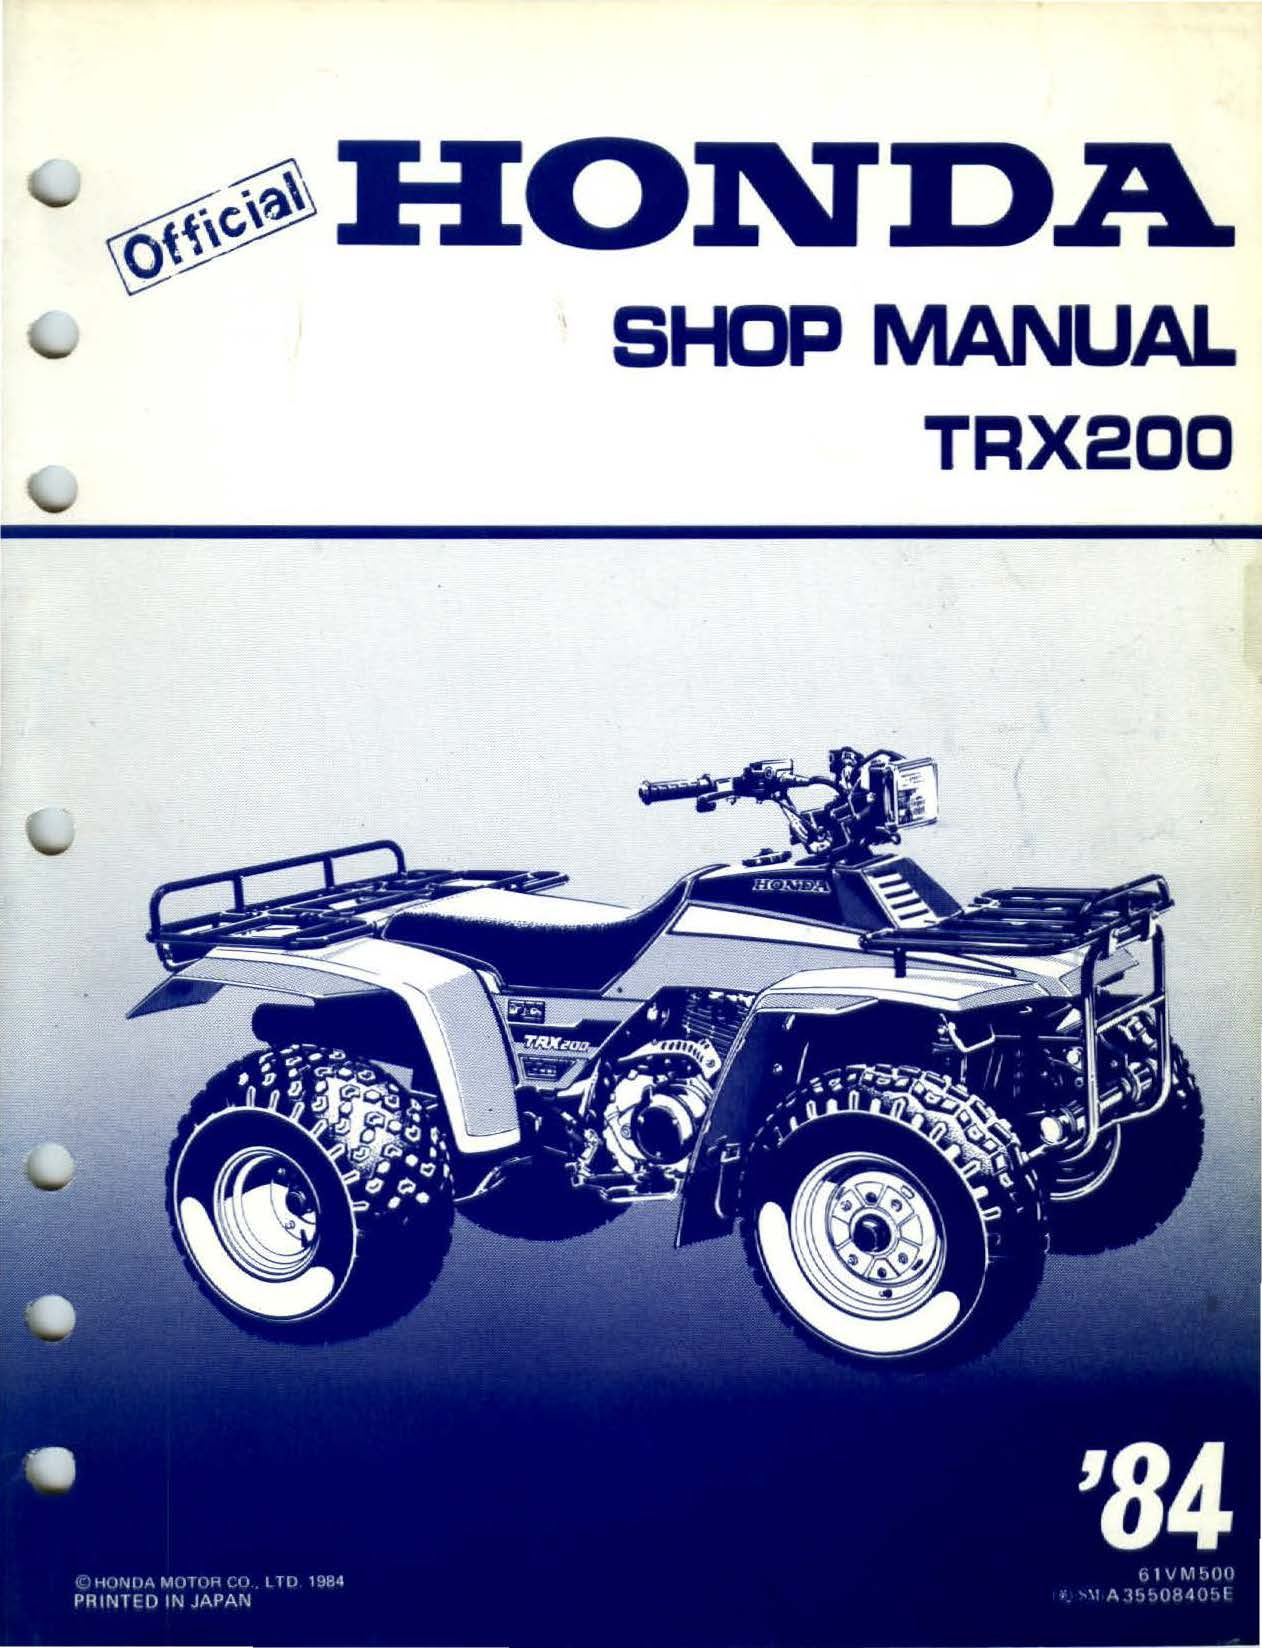 Workshopmanual for Honda TRX200 (1984)